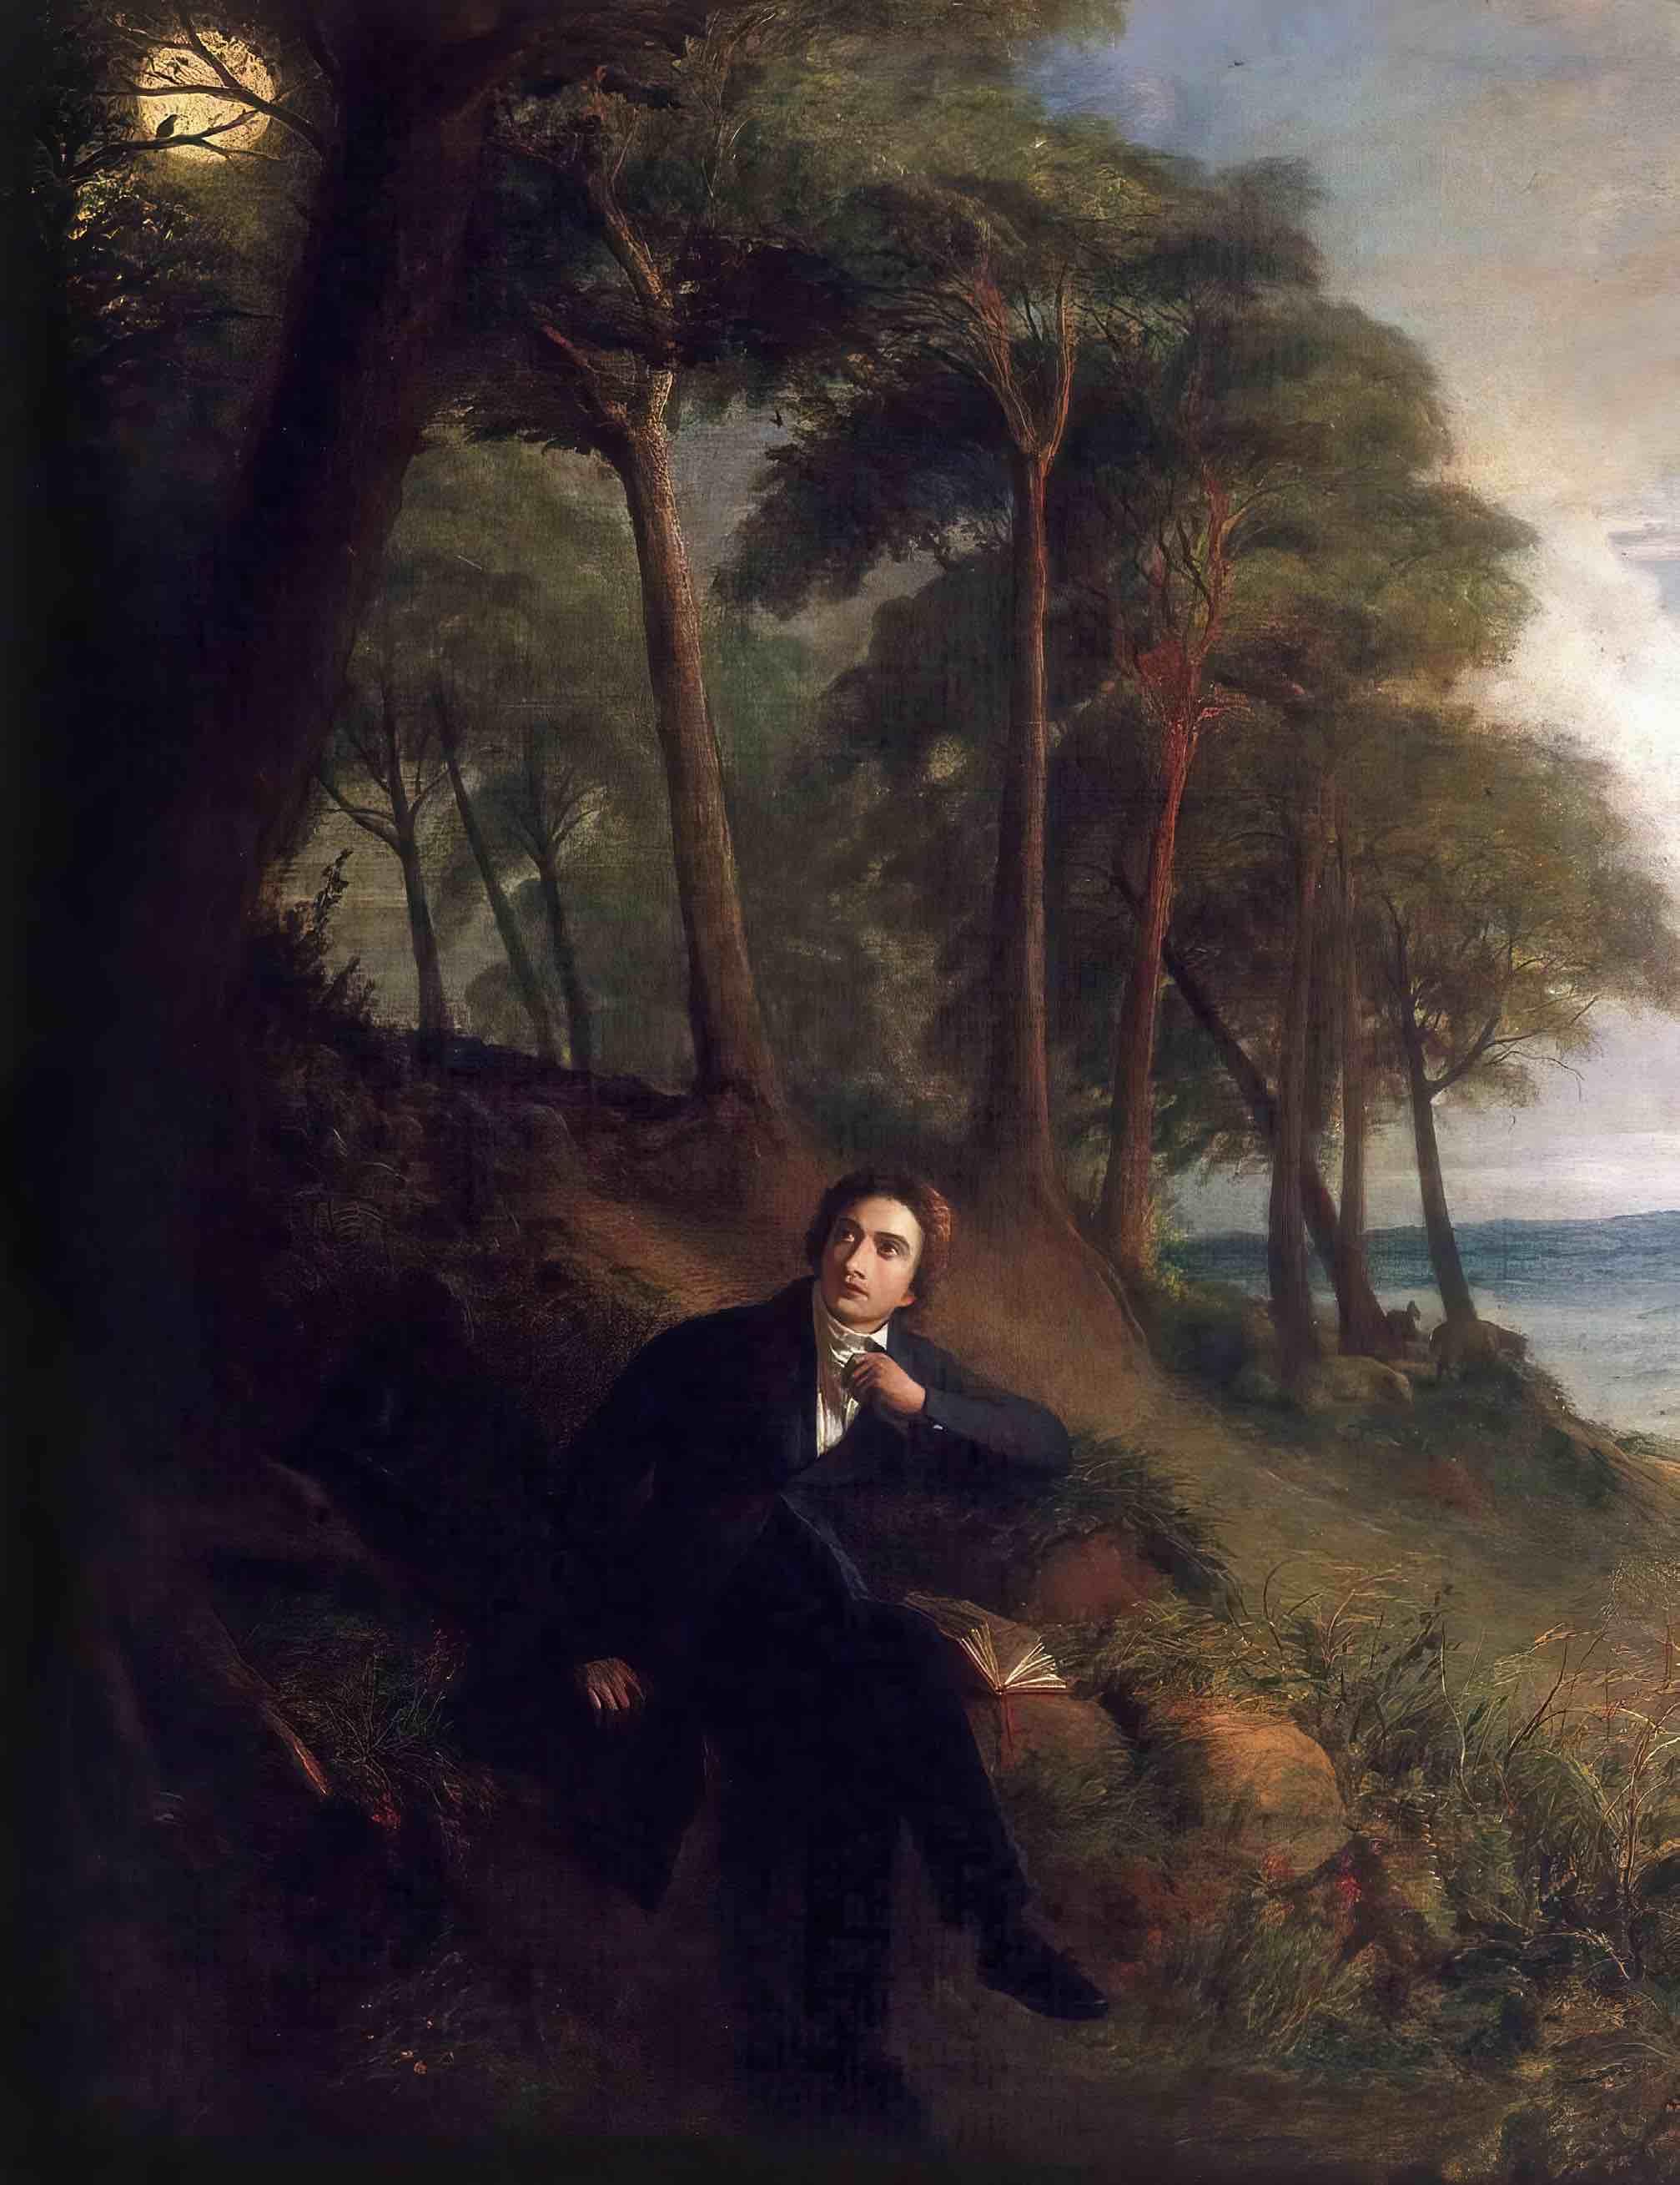 Keats Listening to the Nightingale on Hampstead Heath, 1845, by Joseph Severn